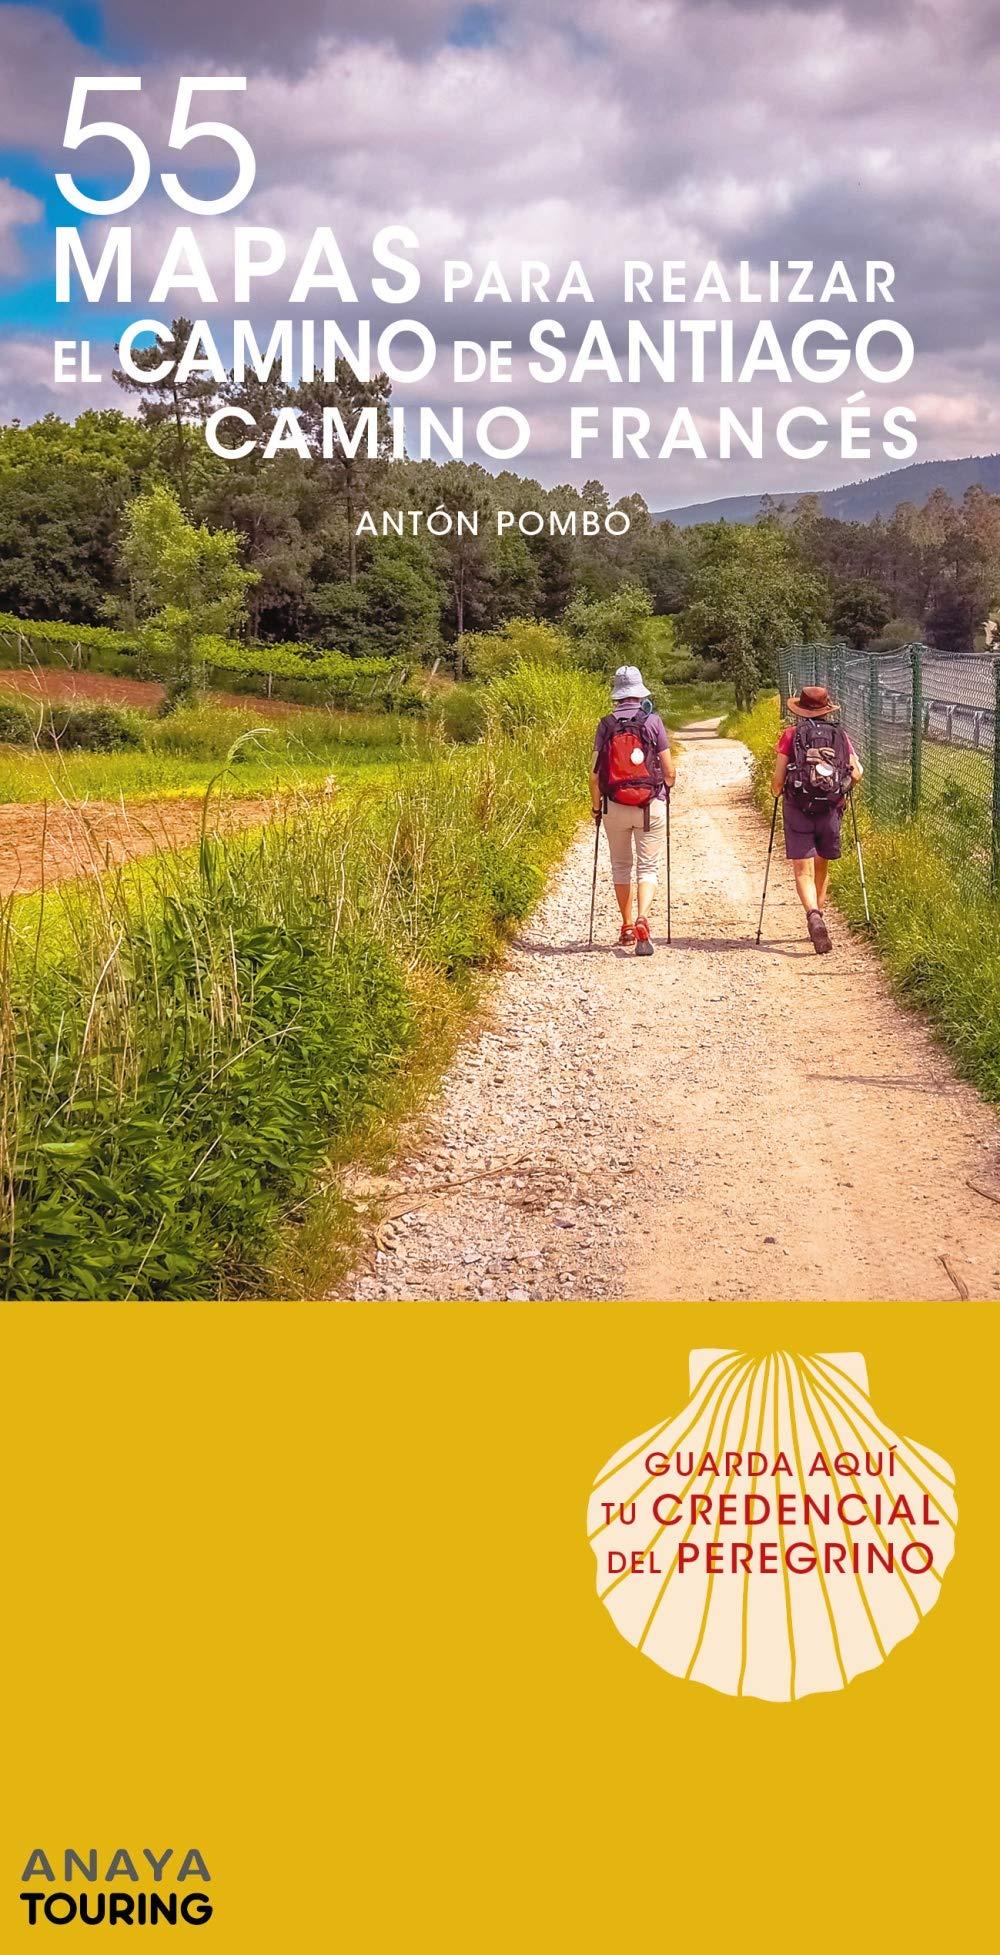 55 Mapas para realizar el Camino de Santiago. Camino Francés (desplegables) (Mapa Touring)